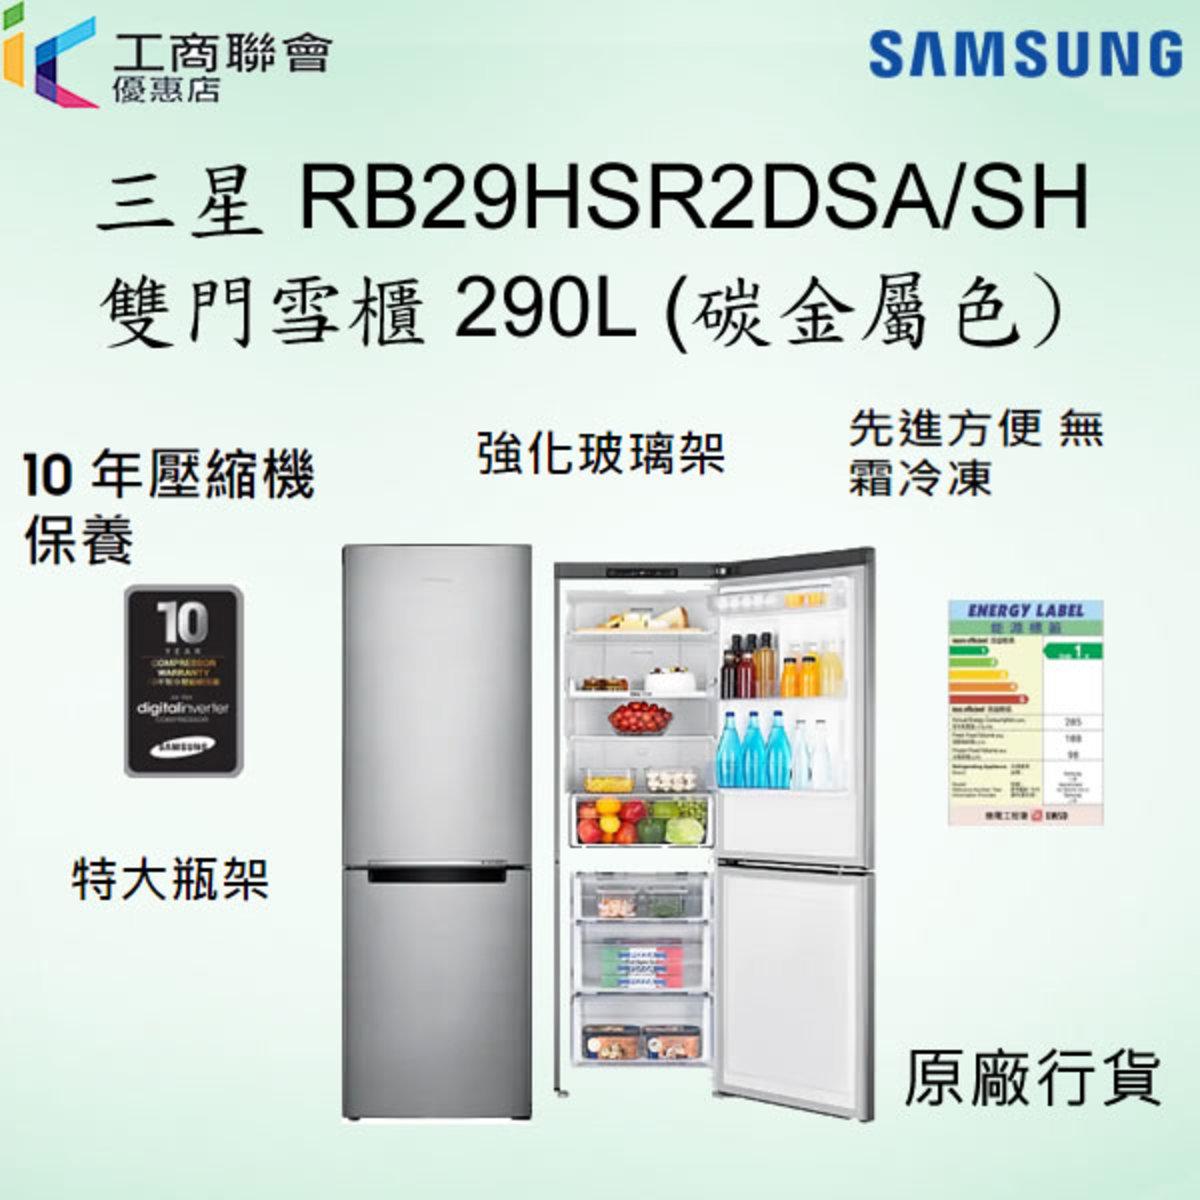 rb29hsr2dsa/sh 290l 雙門雪櫃 (碳金屬色)